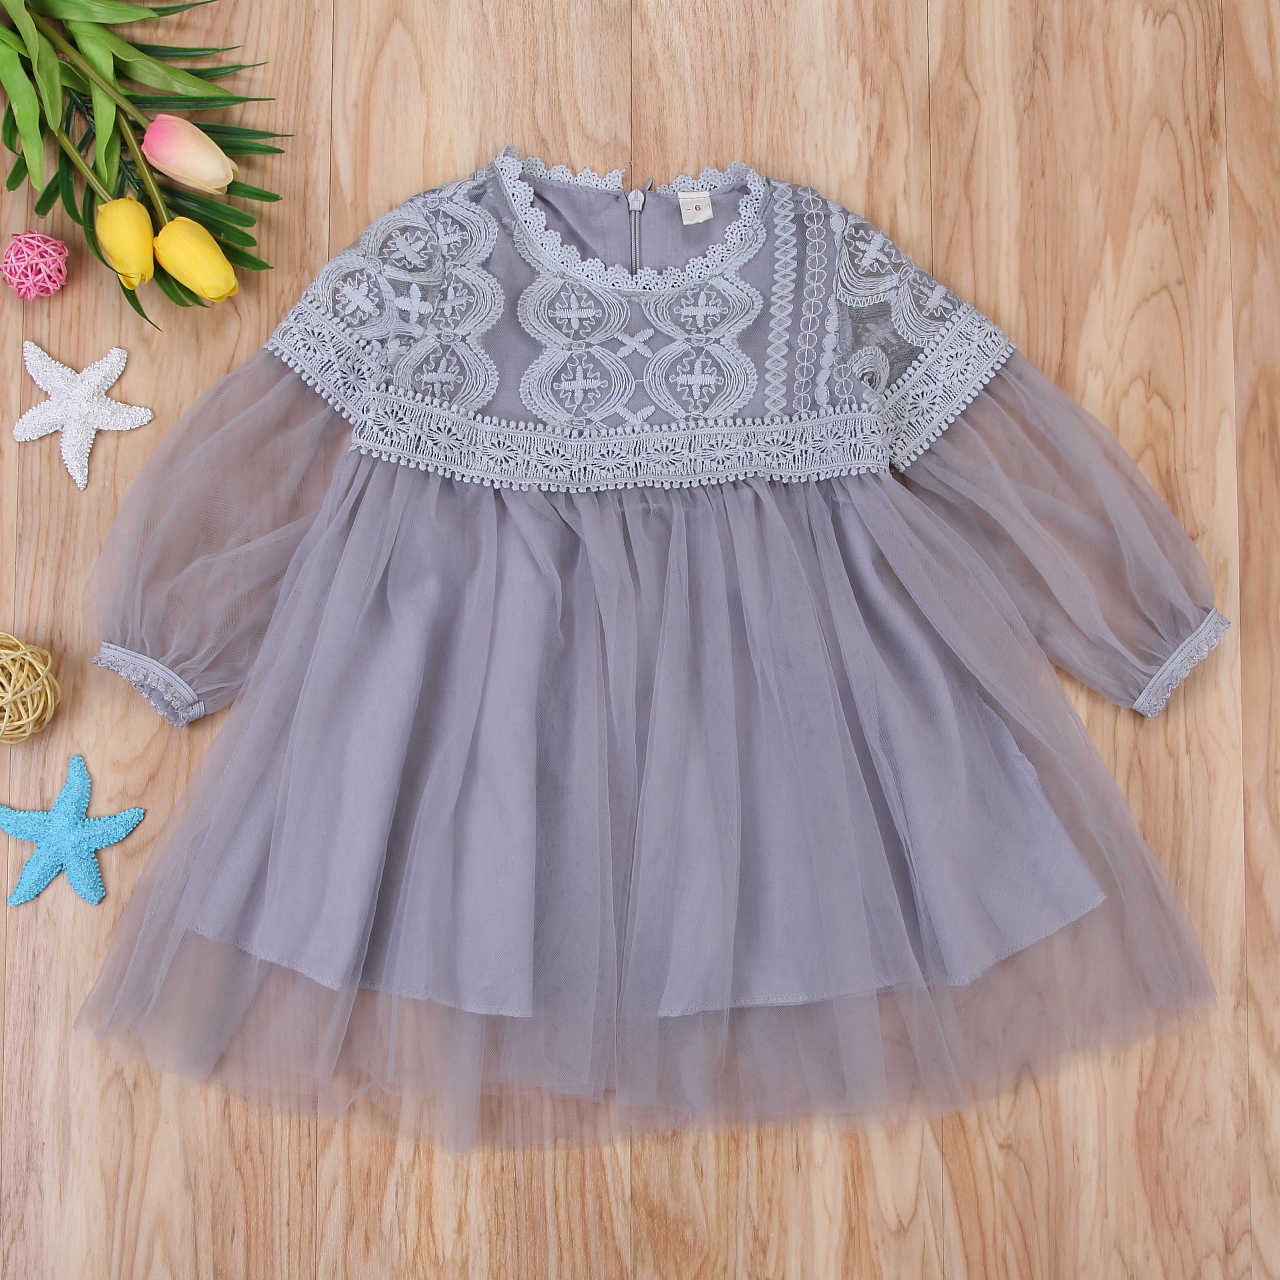 ff58b870c2d ... Mesh Tutu Dress Gray/Pink Baby Girls Long Sleeve Kids Hot Tulle Party  Wedding Dress ...